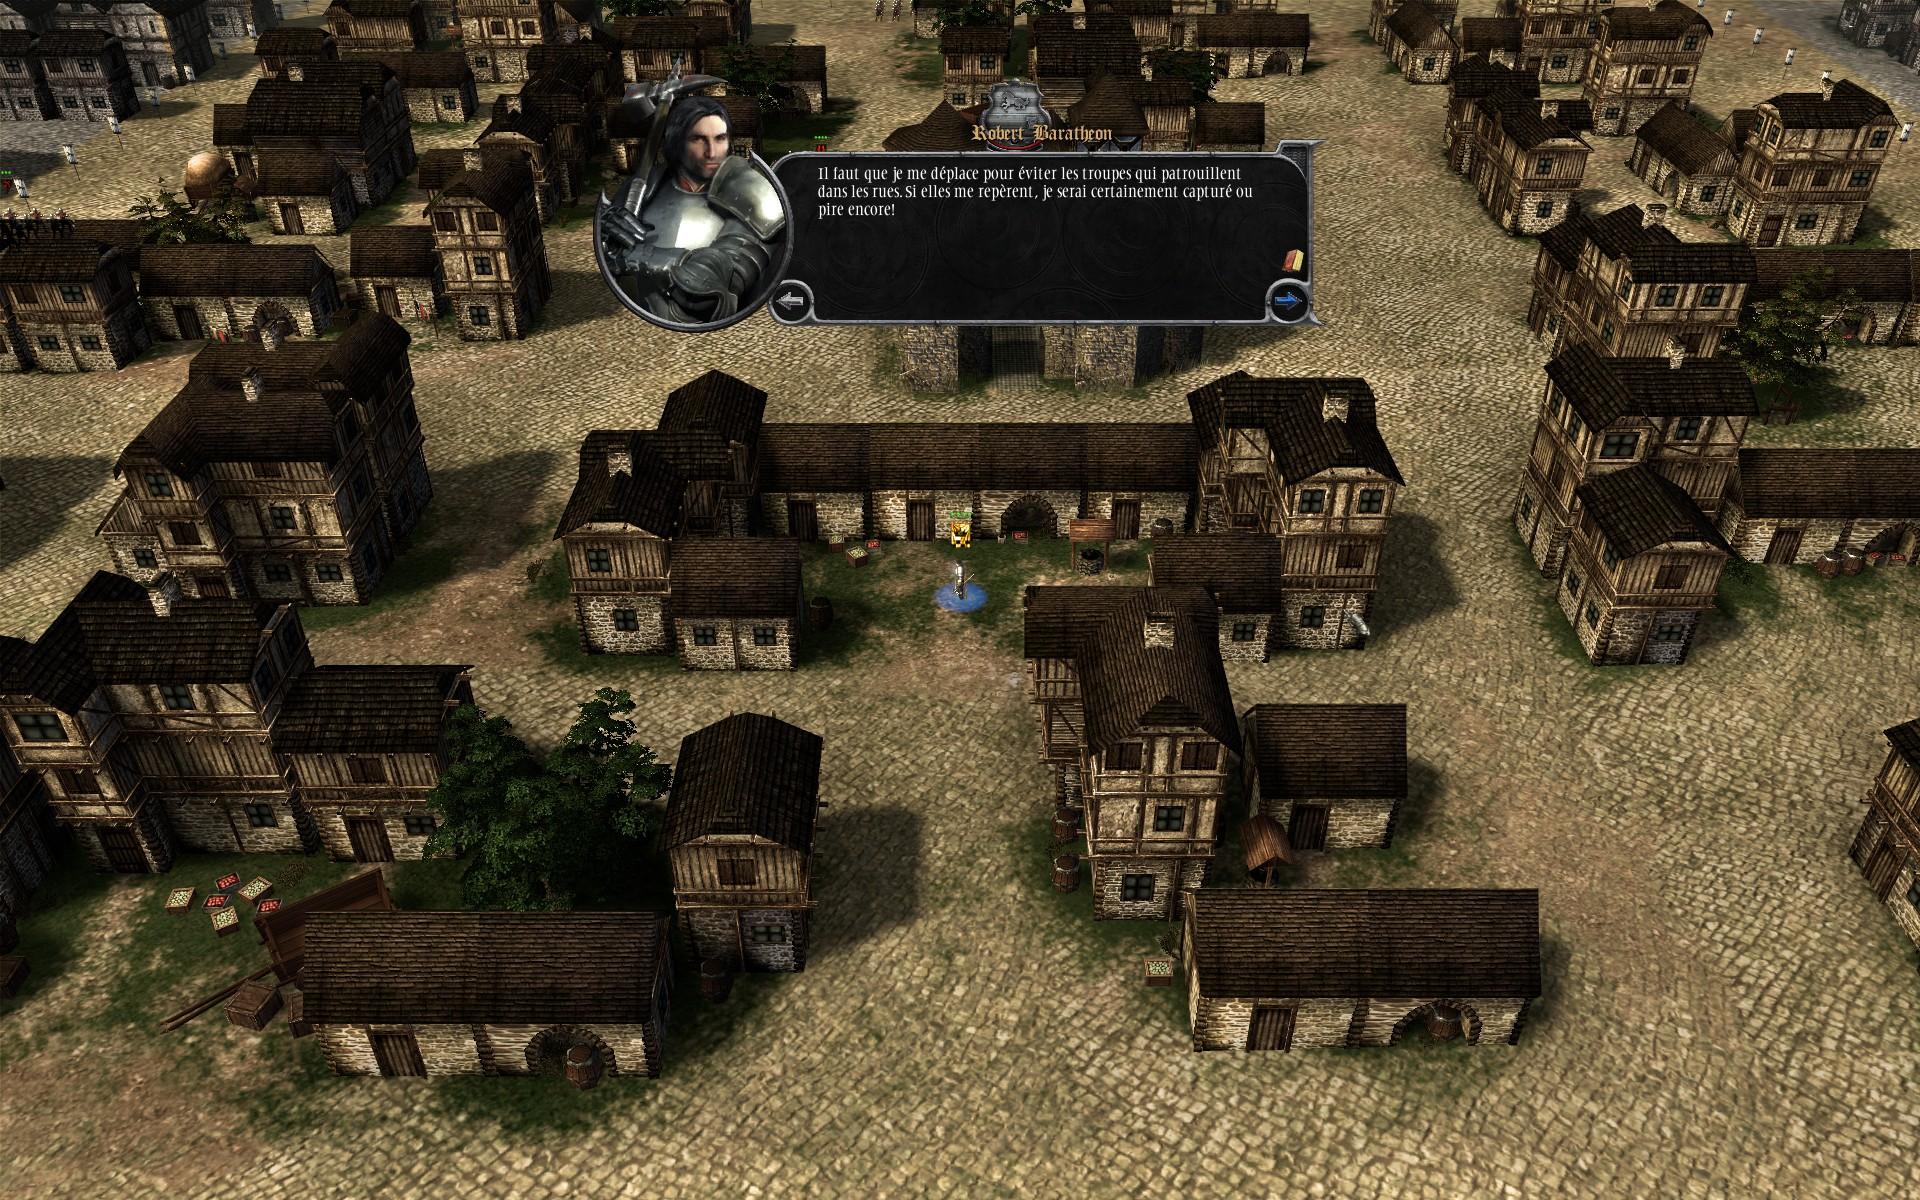 AGameofThrones-Genesis PC Test 010